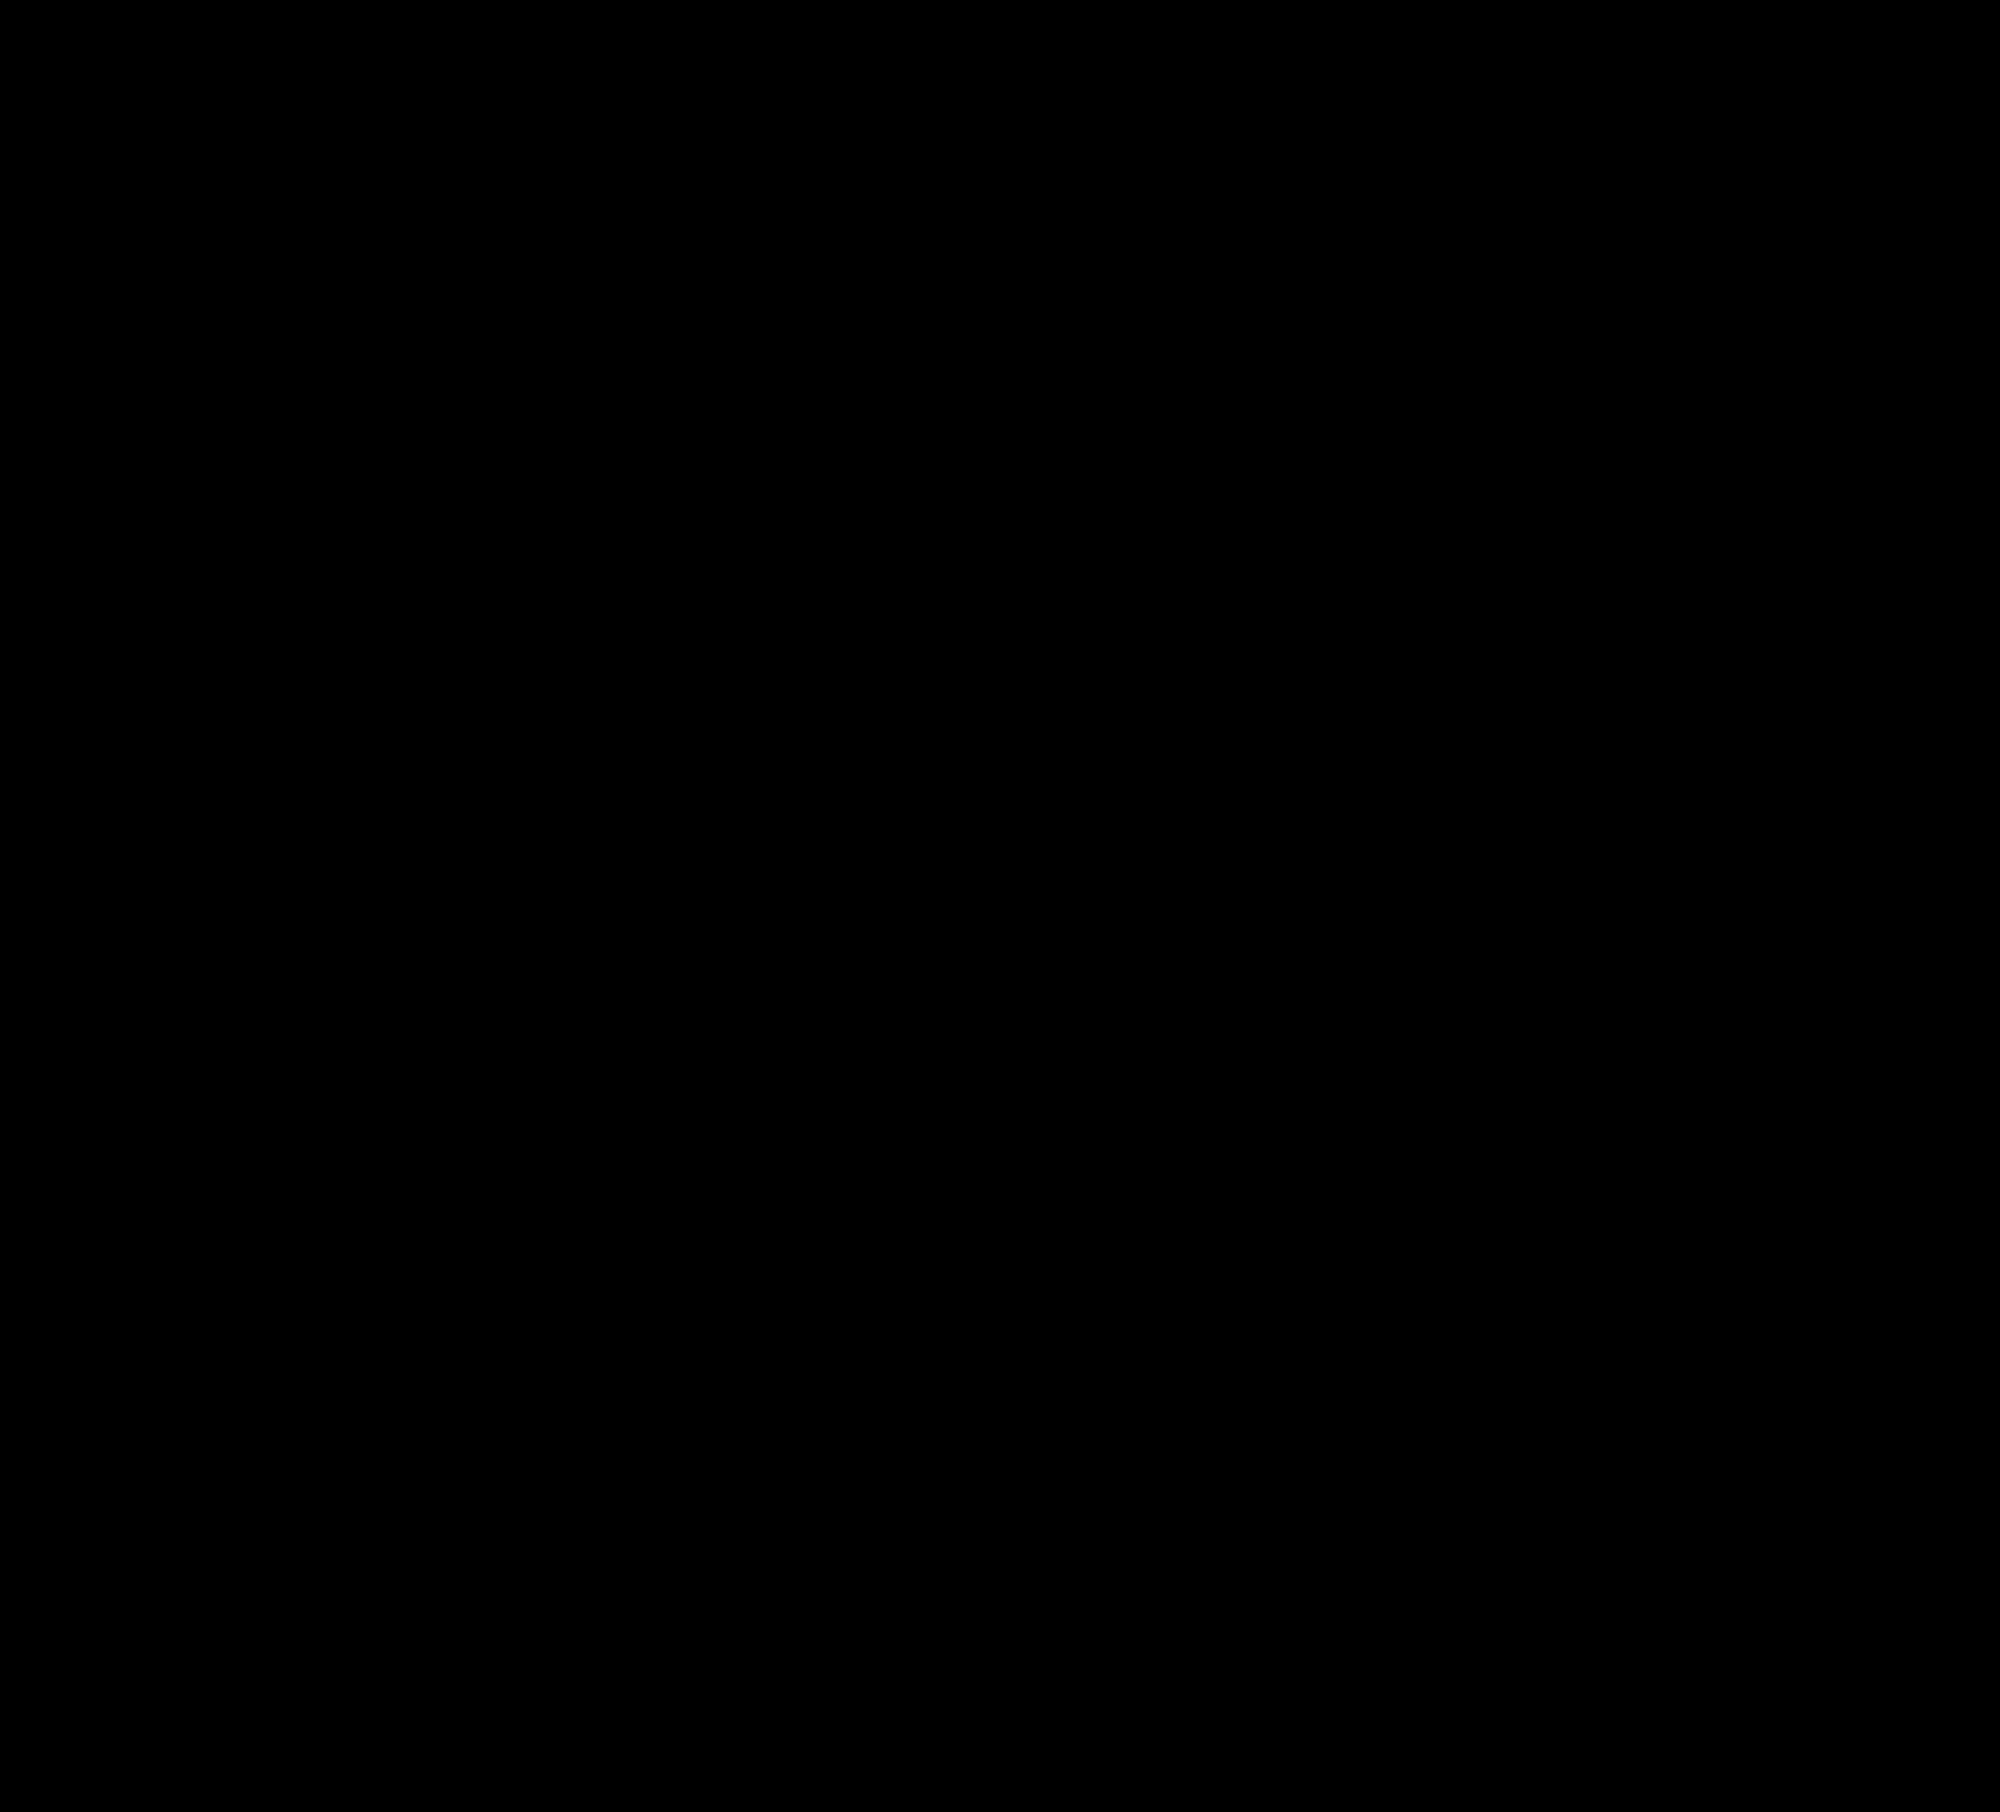 figure skate silhouette at getdrawings com free for personal use rh getdrawings com